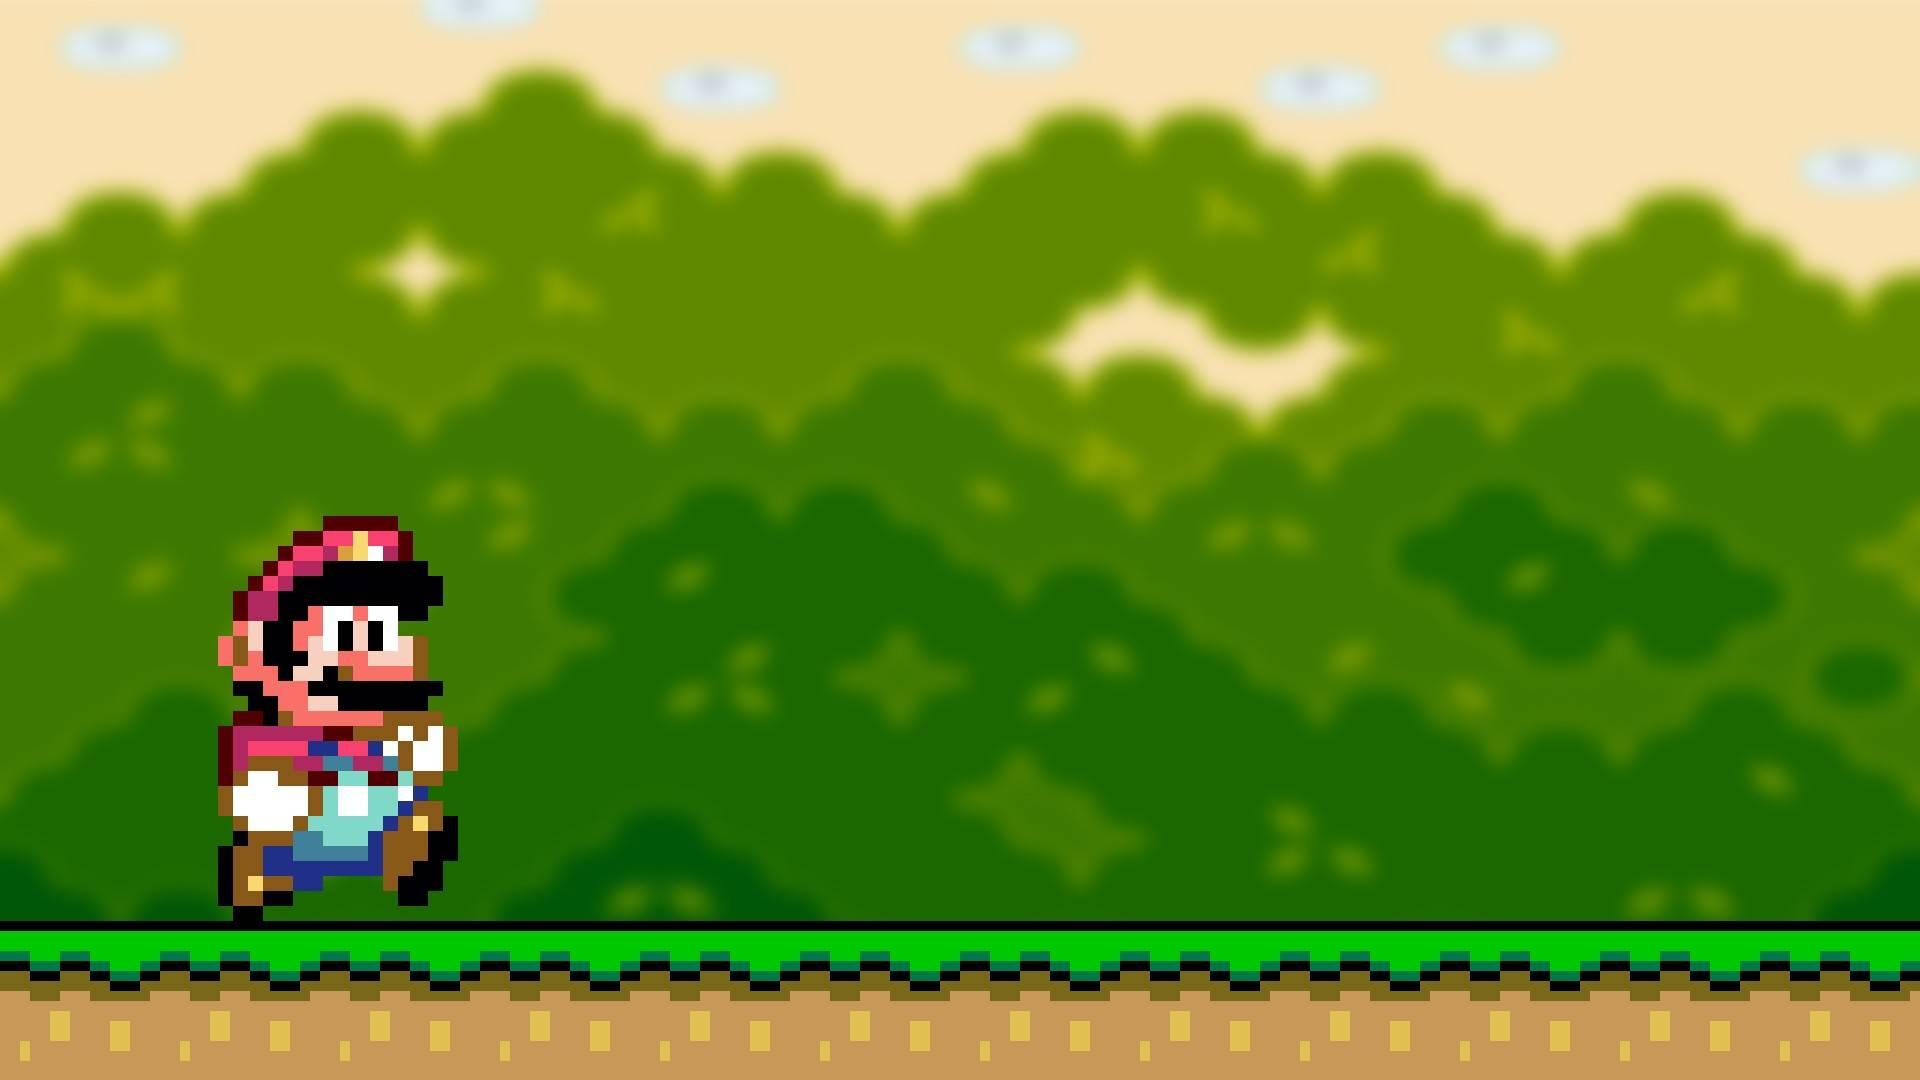 Video Game Nintendo Hd Wallpapers Desktop Backgrounds Mobile 1920x1080